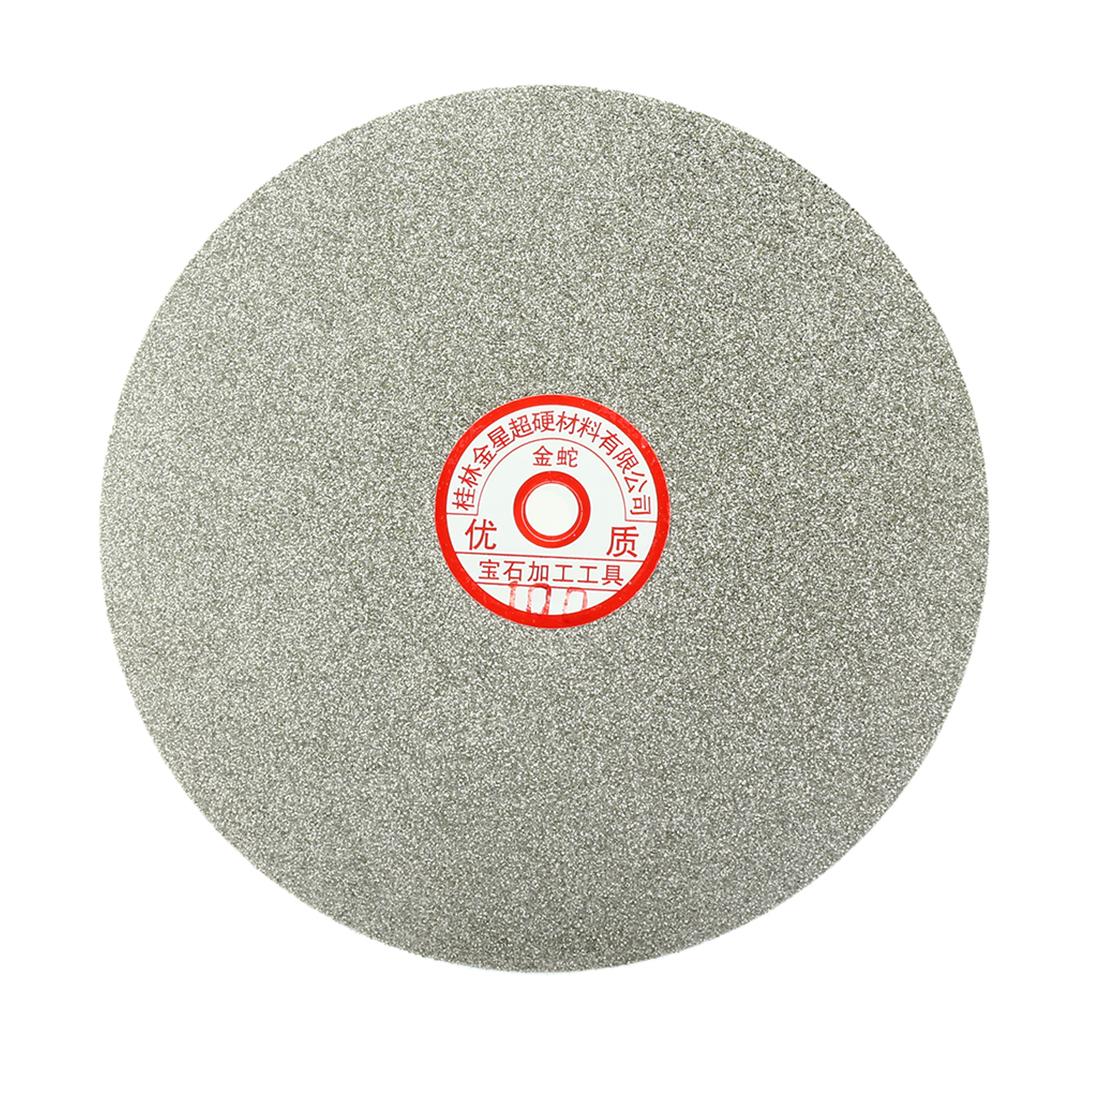 200mm 8-inch Grit 100 Diamond Coated Flat Lap Disk Wheel Grinding Sanding Disc